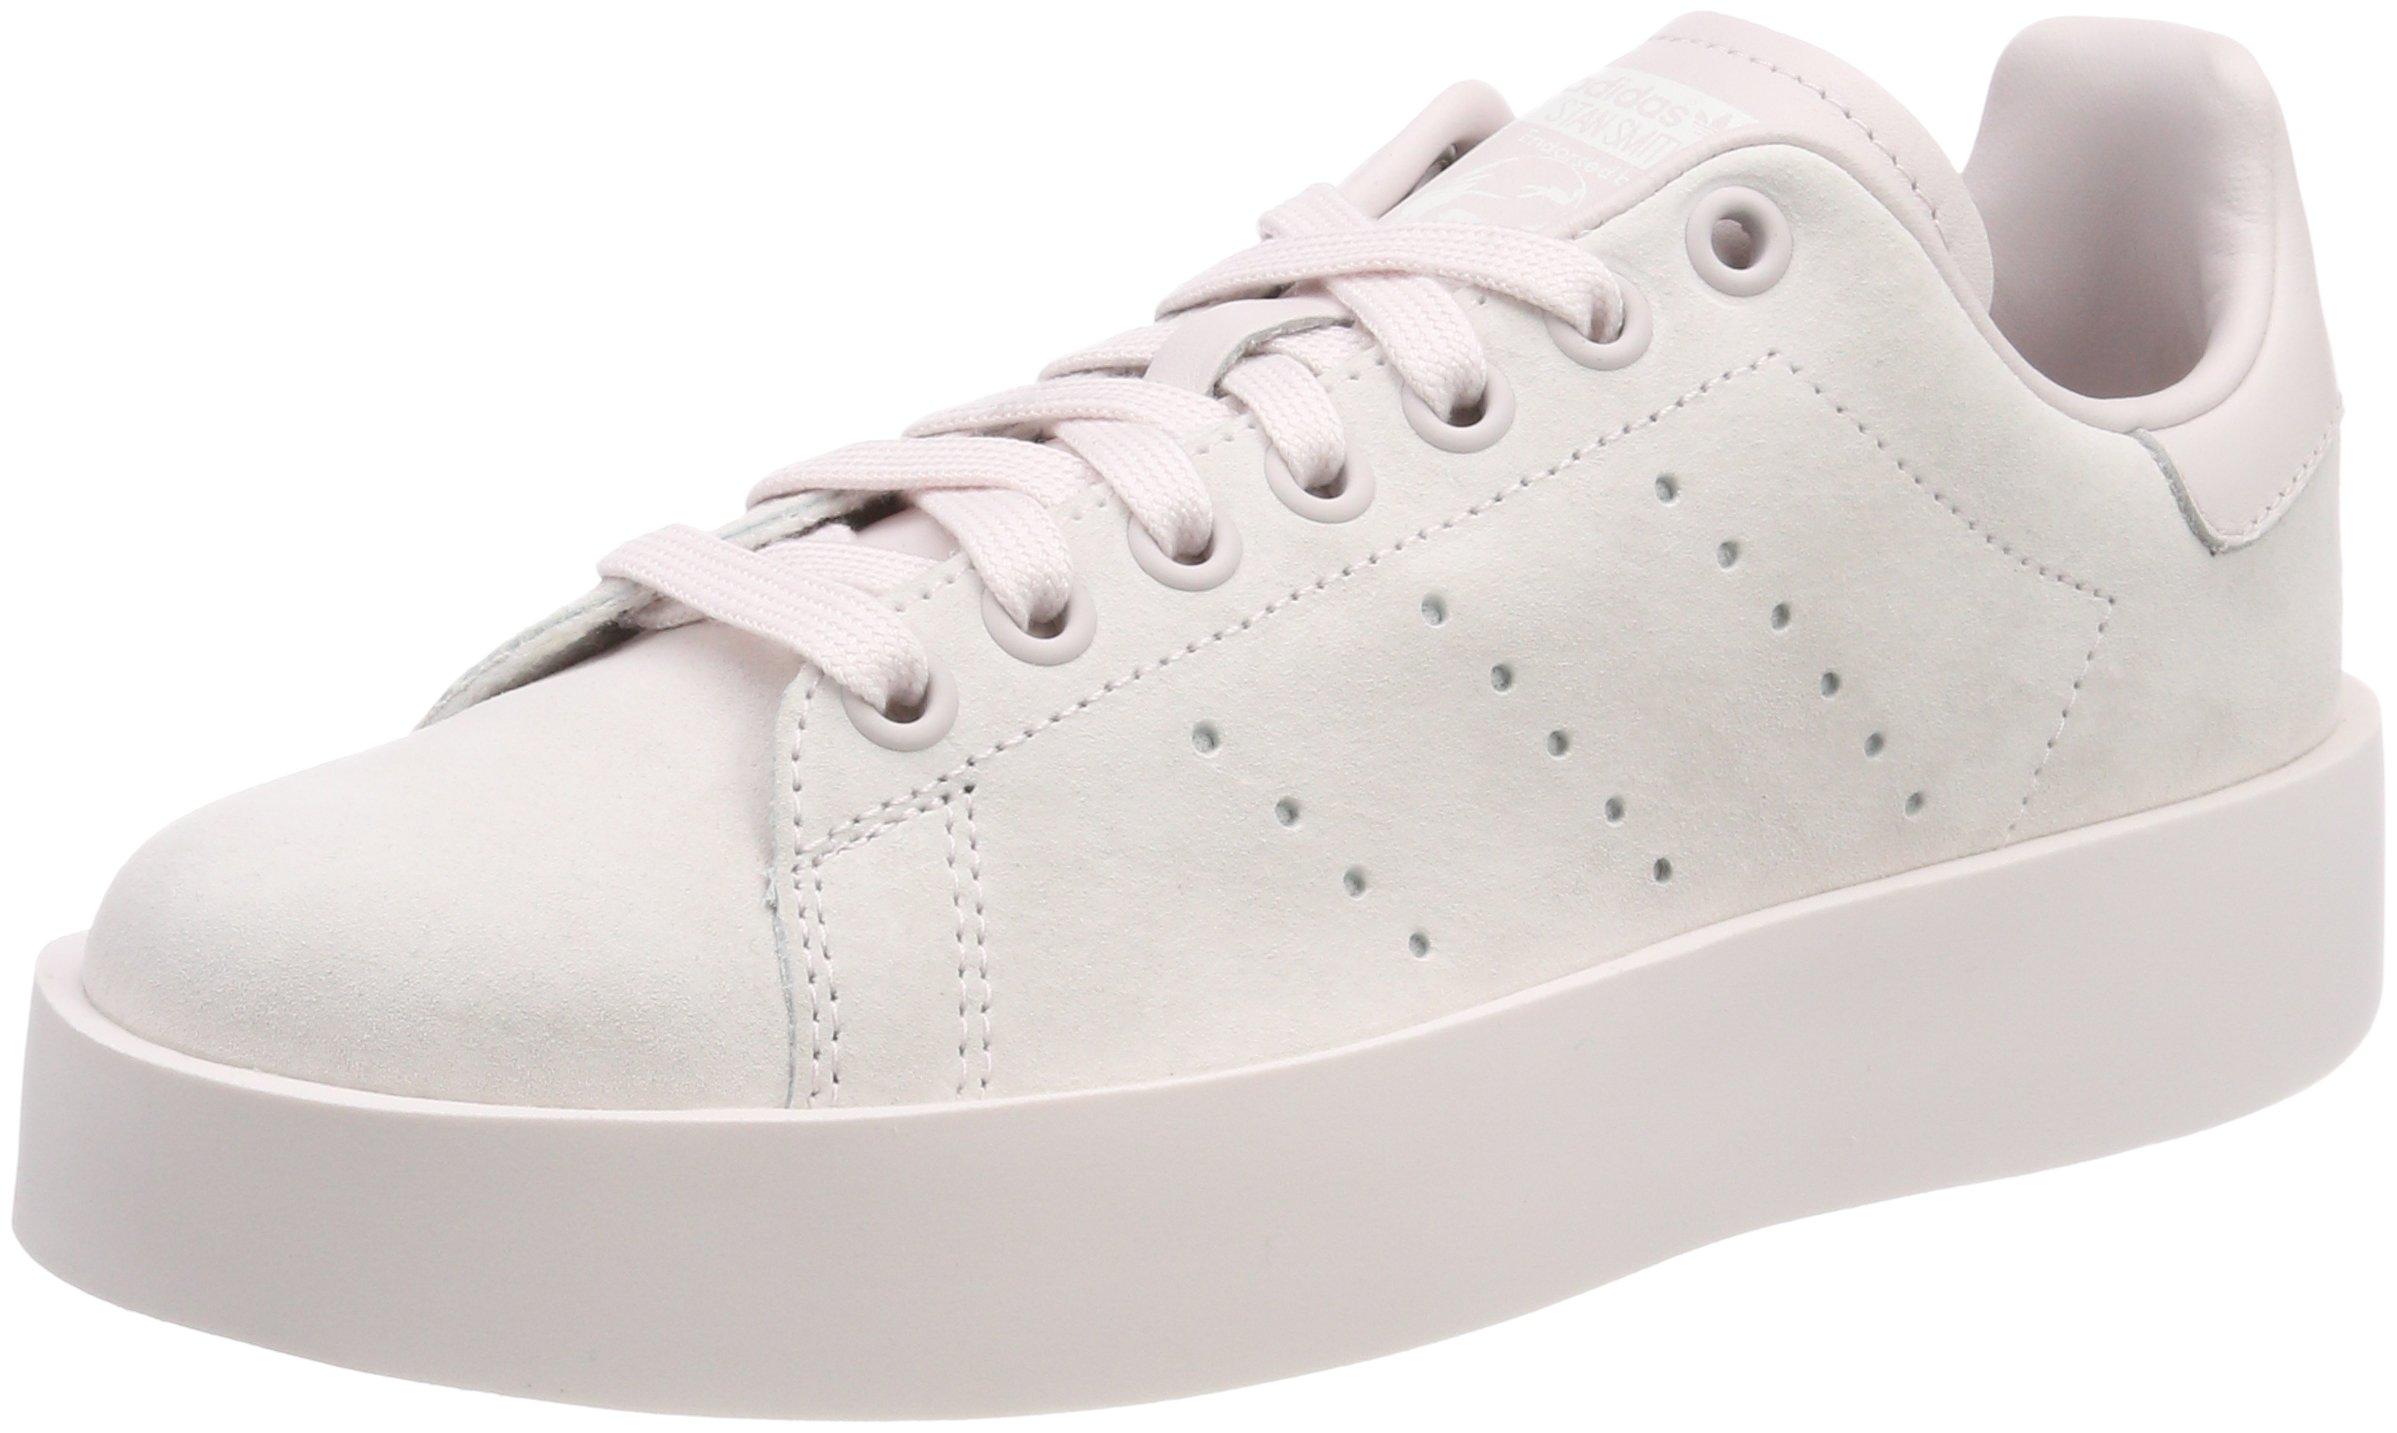 adidas Stan Smith Bold Womens Trainers Light Pink - 7 UK